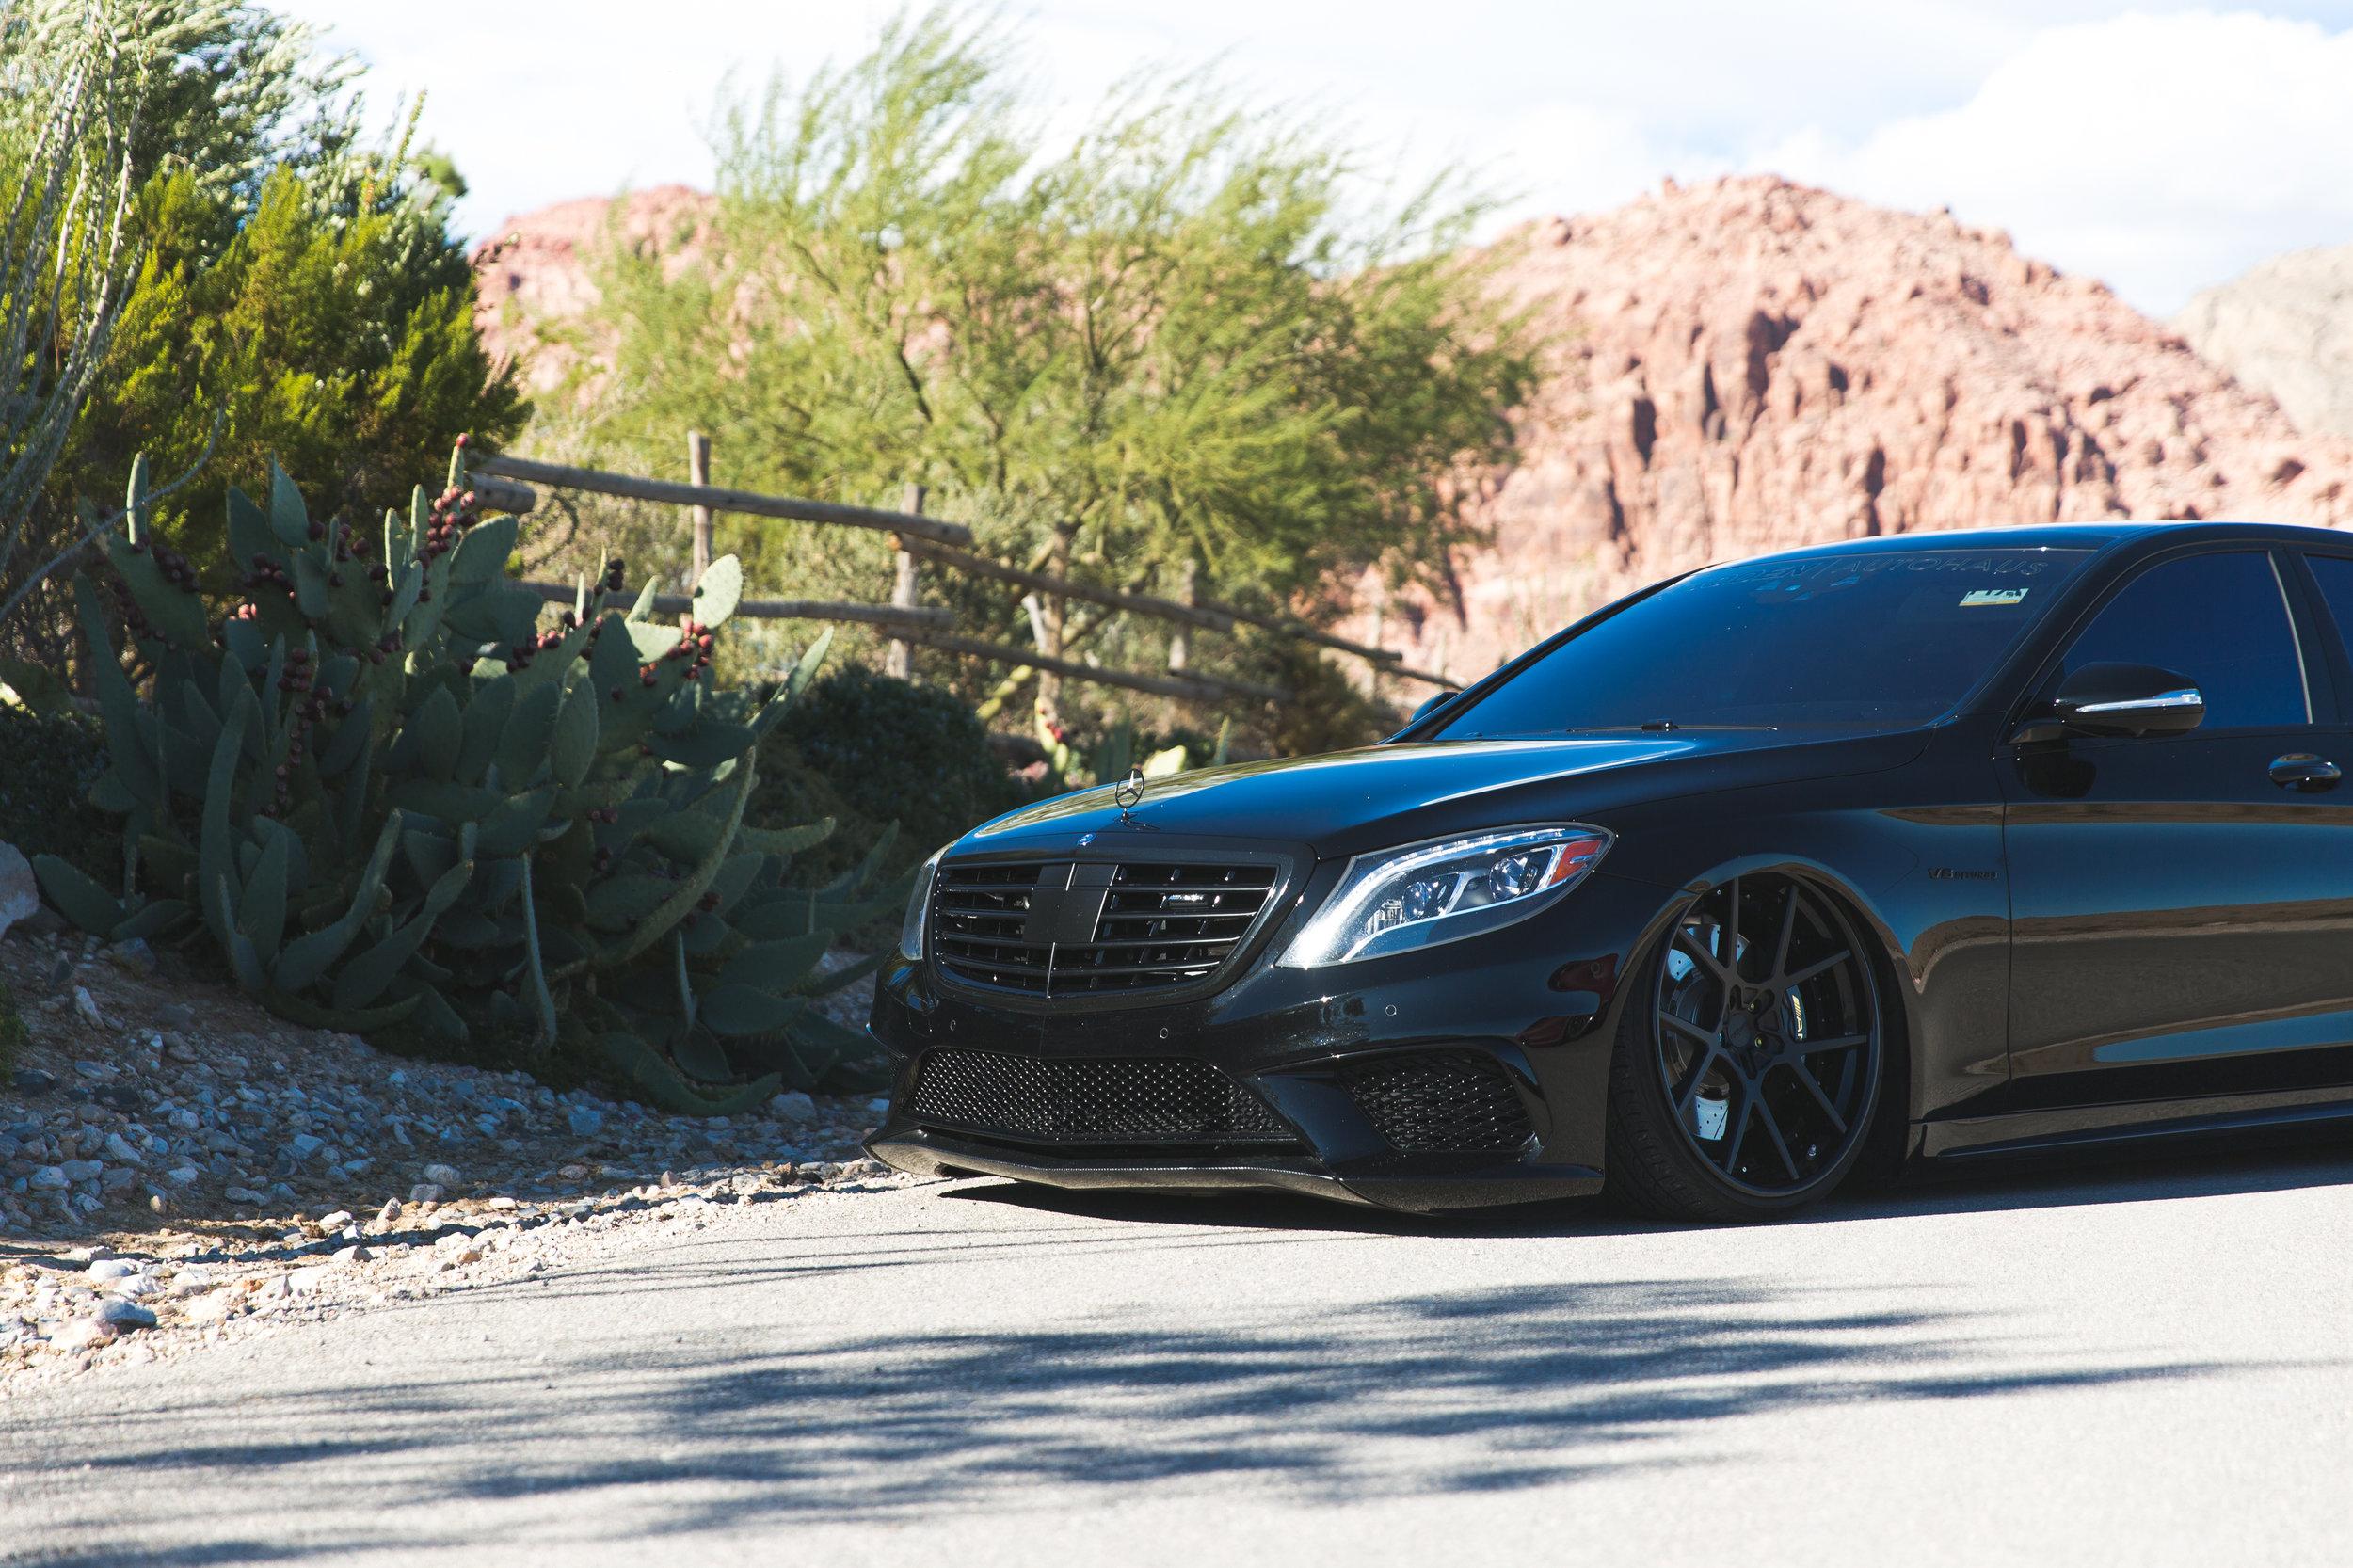 Stay_Driven_SEMA_Mercedes_S63-13.jpg